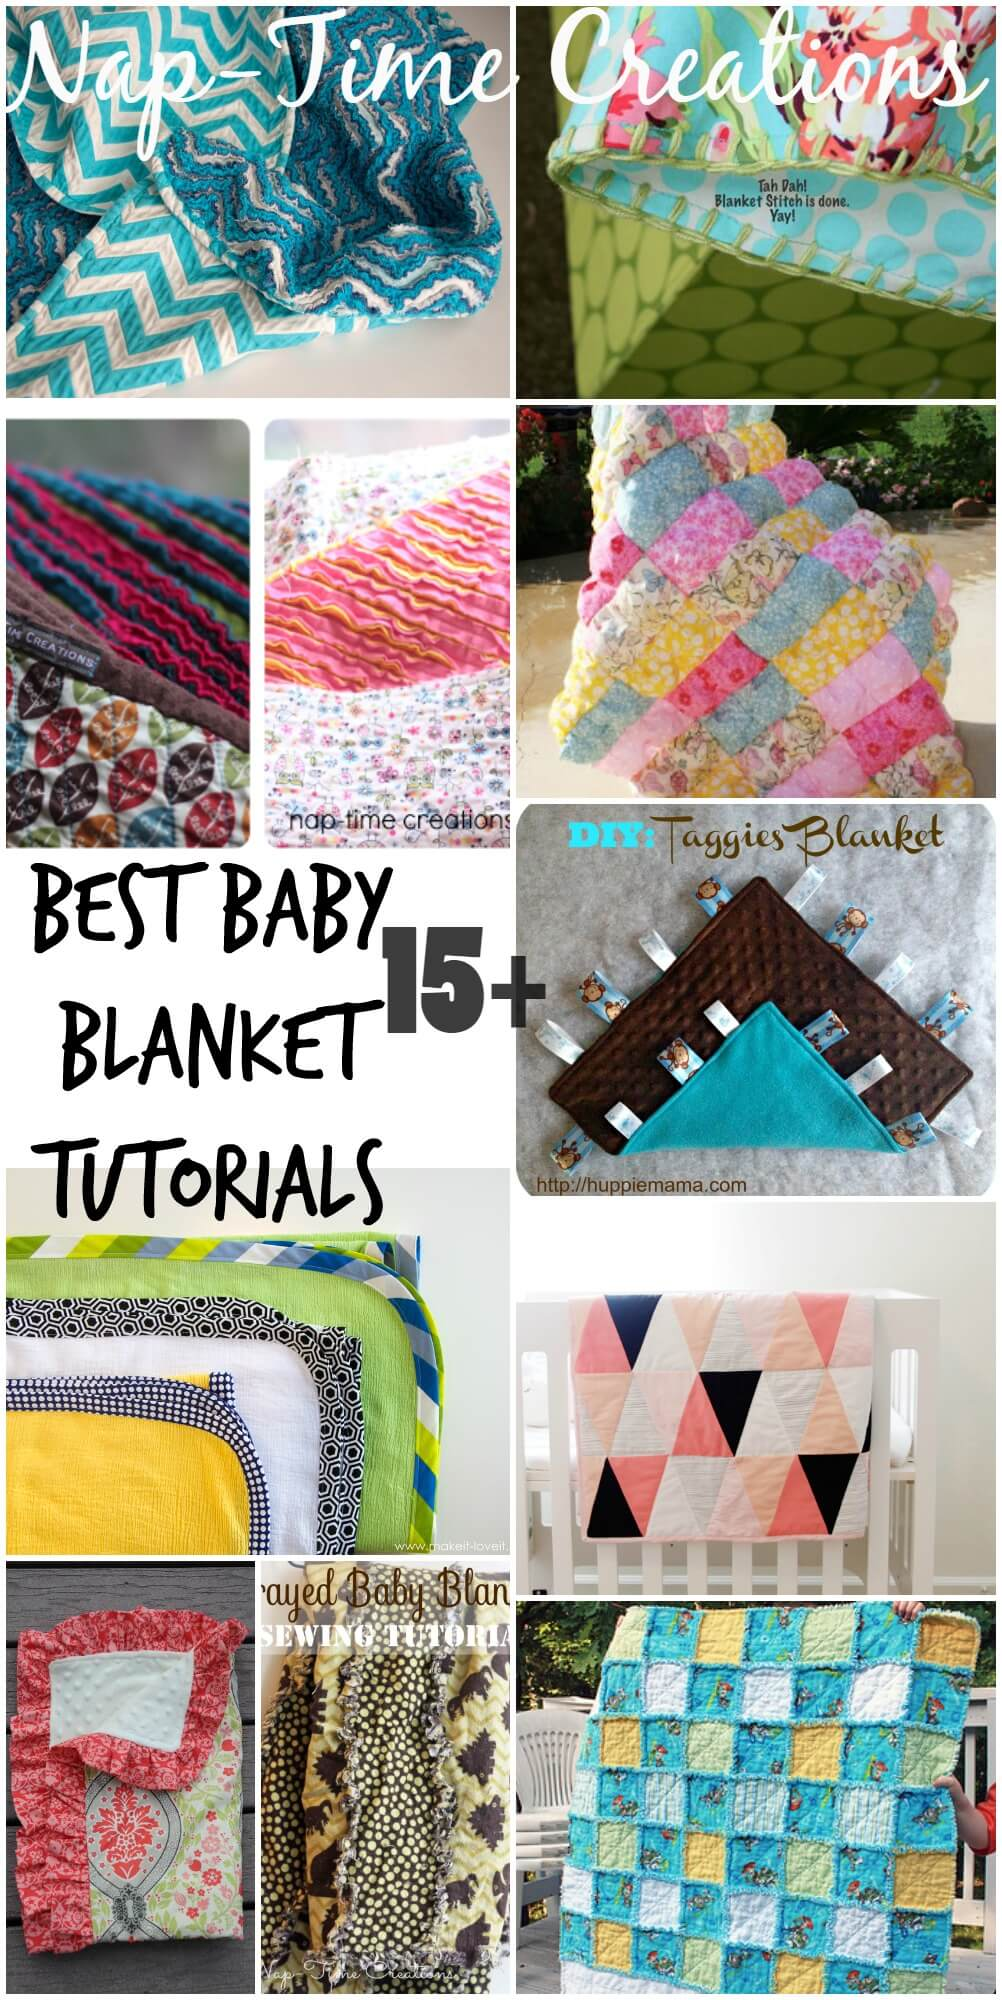 Best Baby Blanket Tutorials